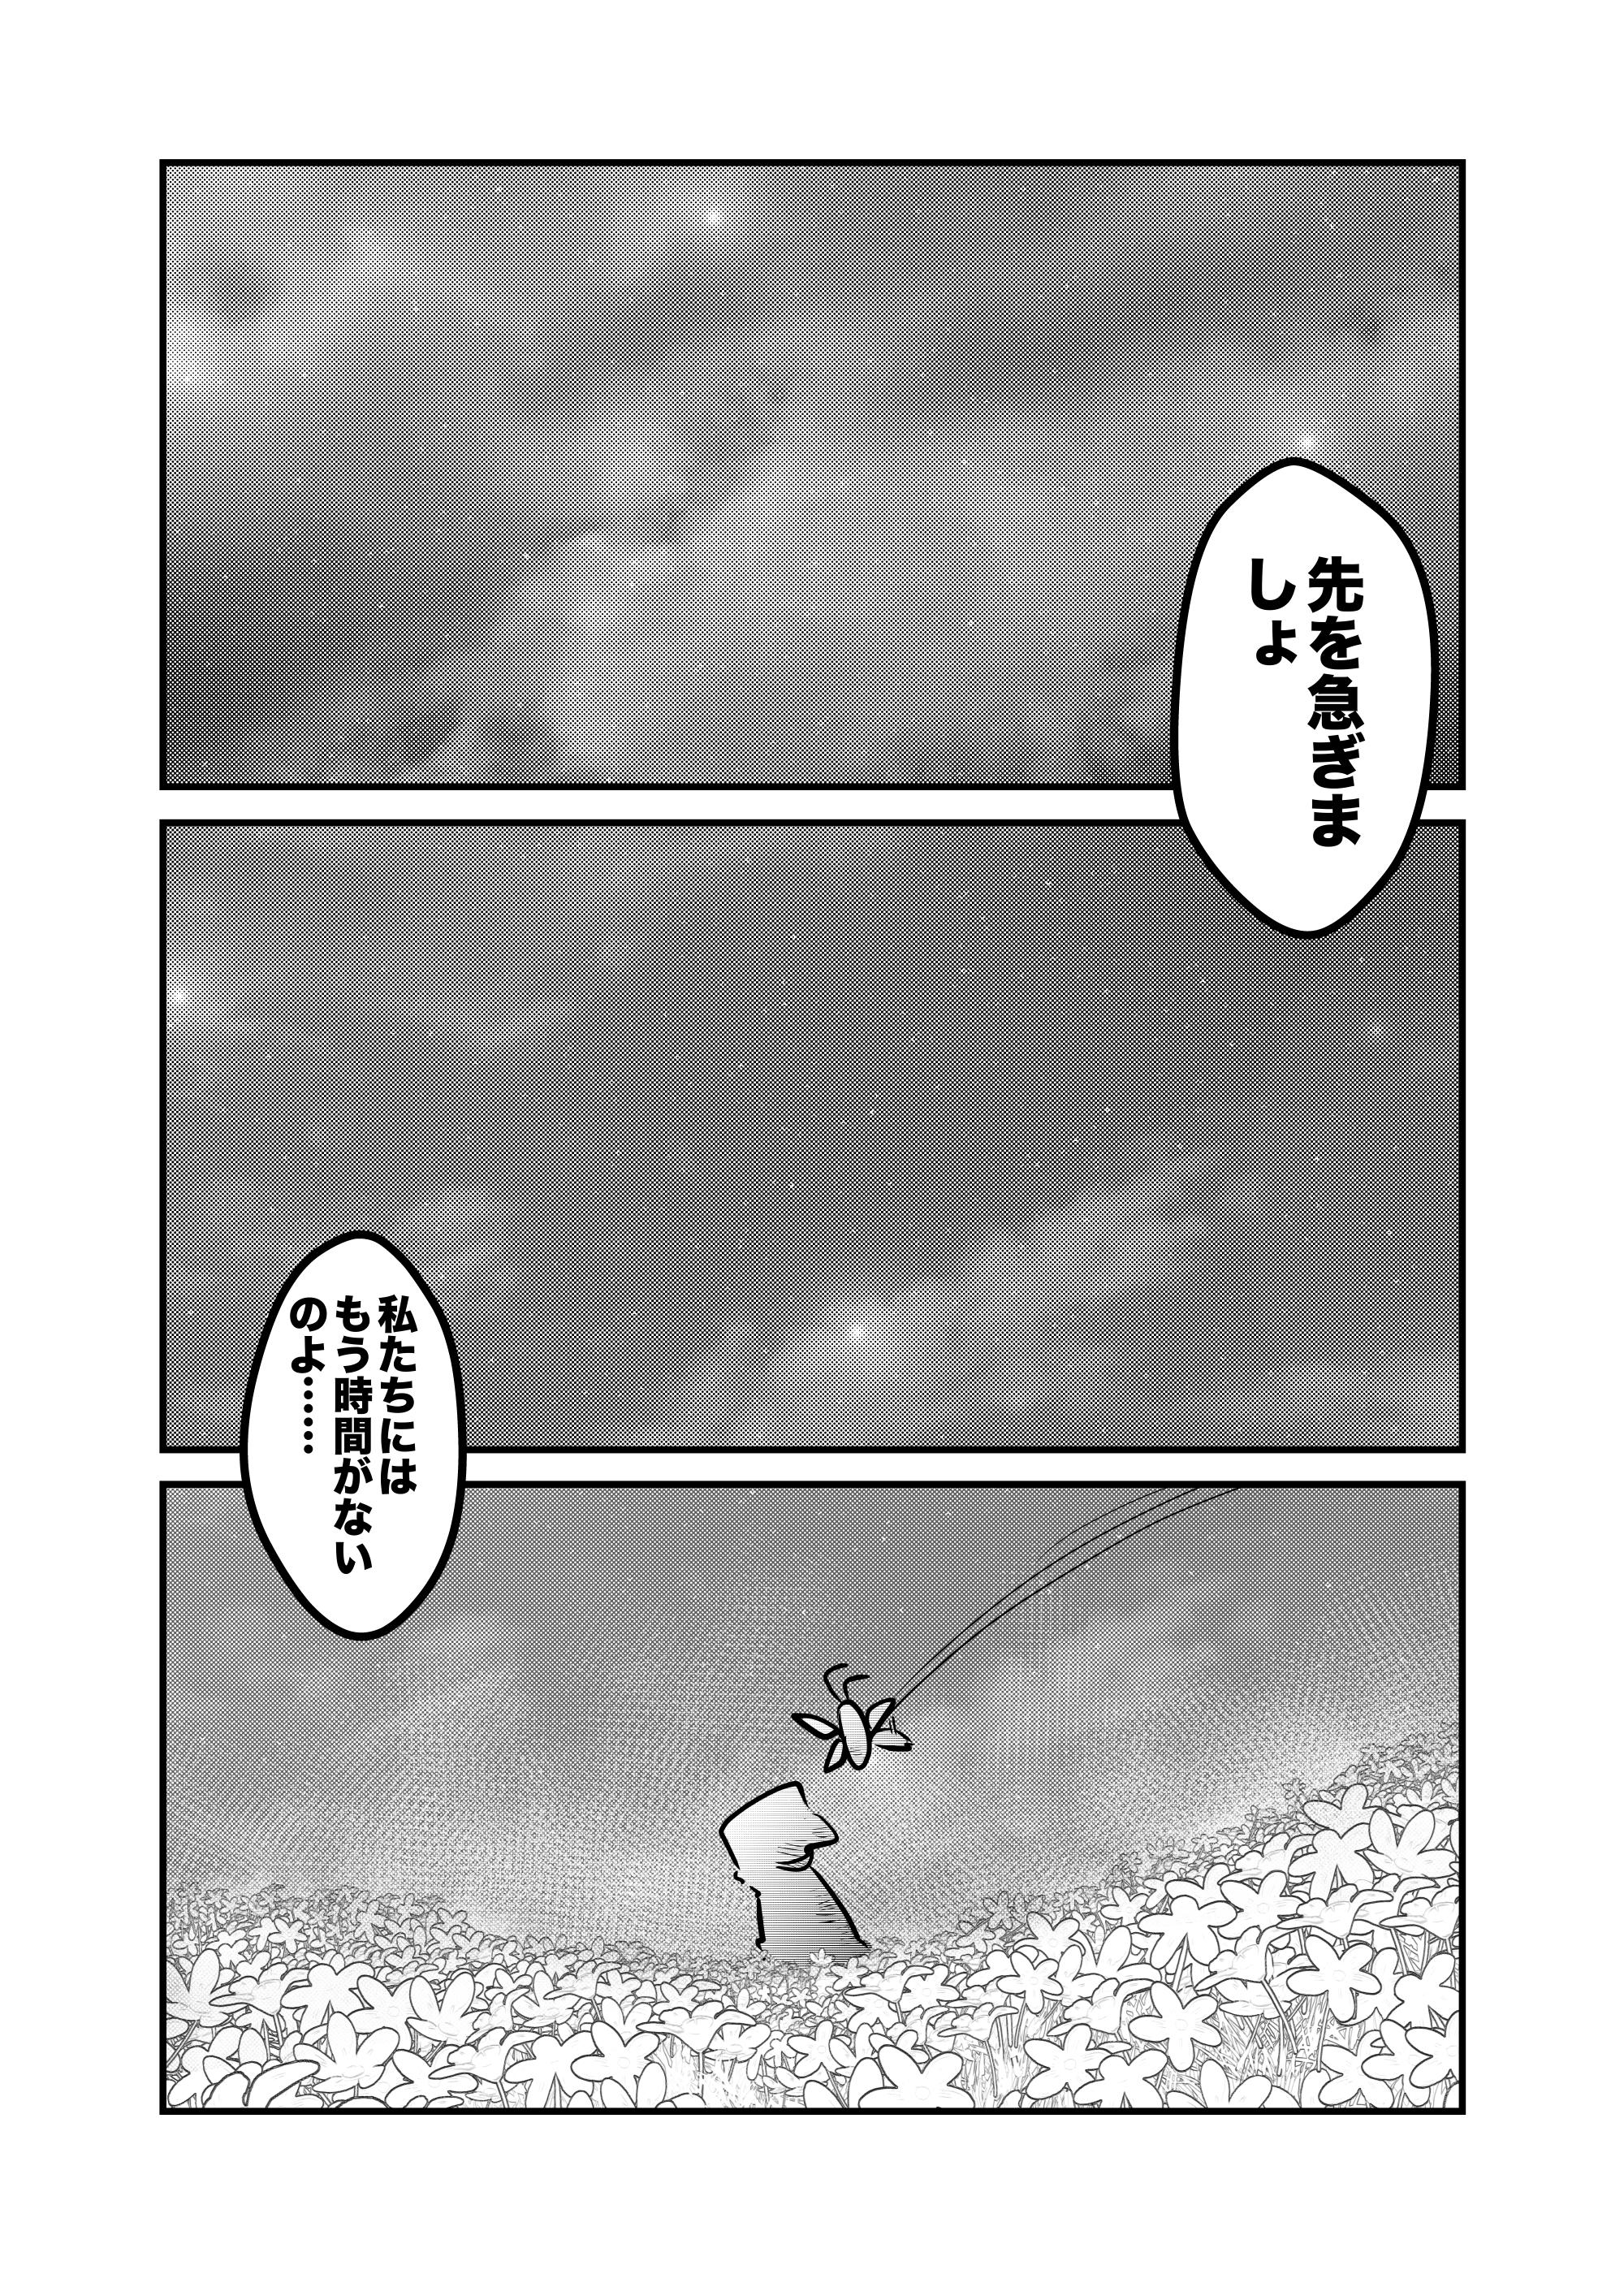 f:id:terashimaru117:20210914231027p:plain